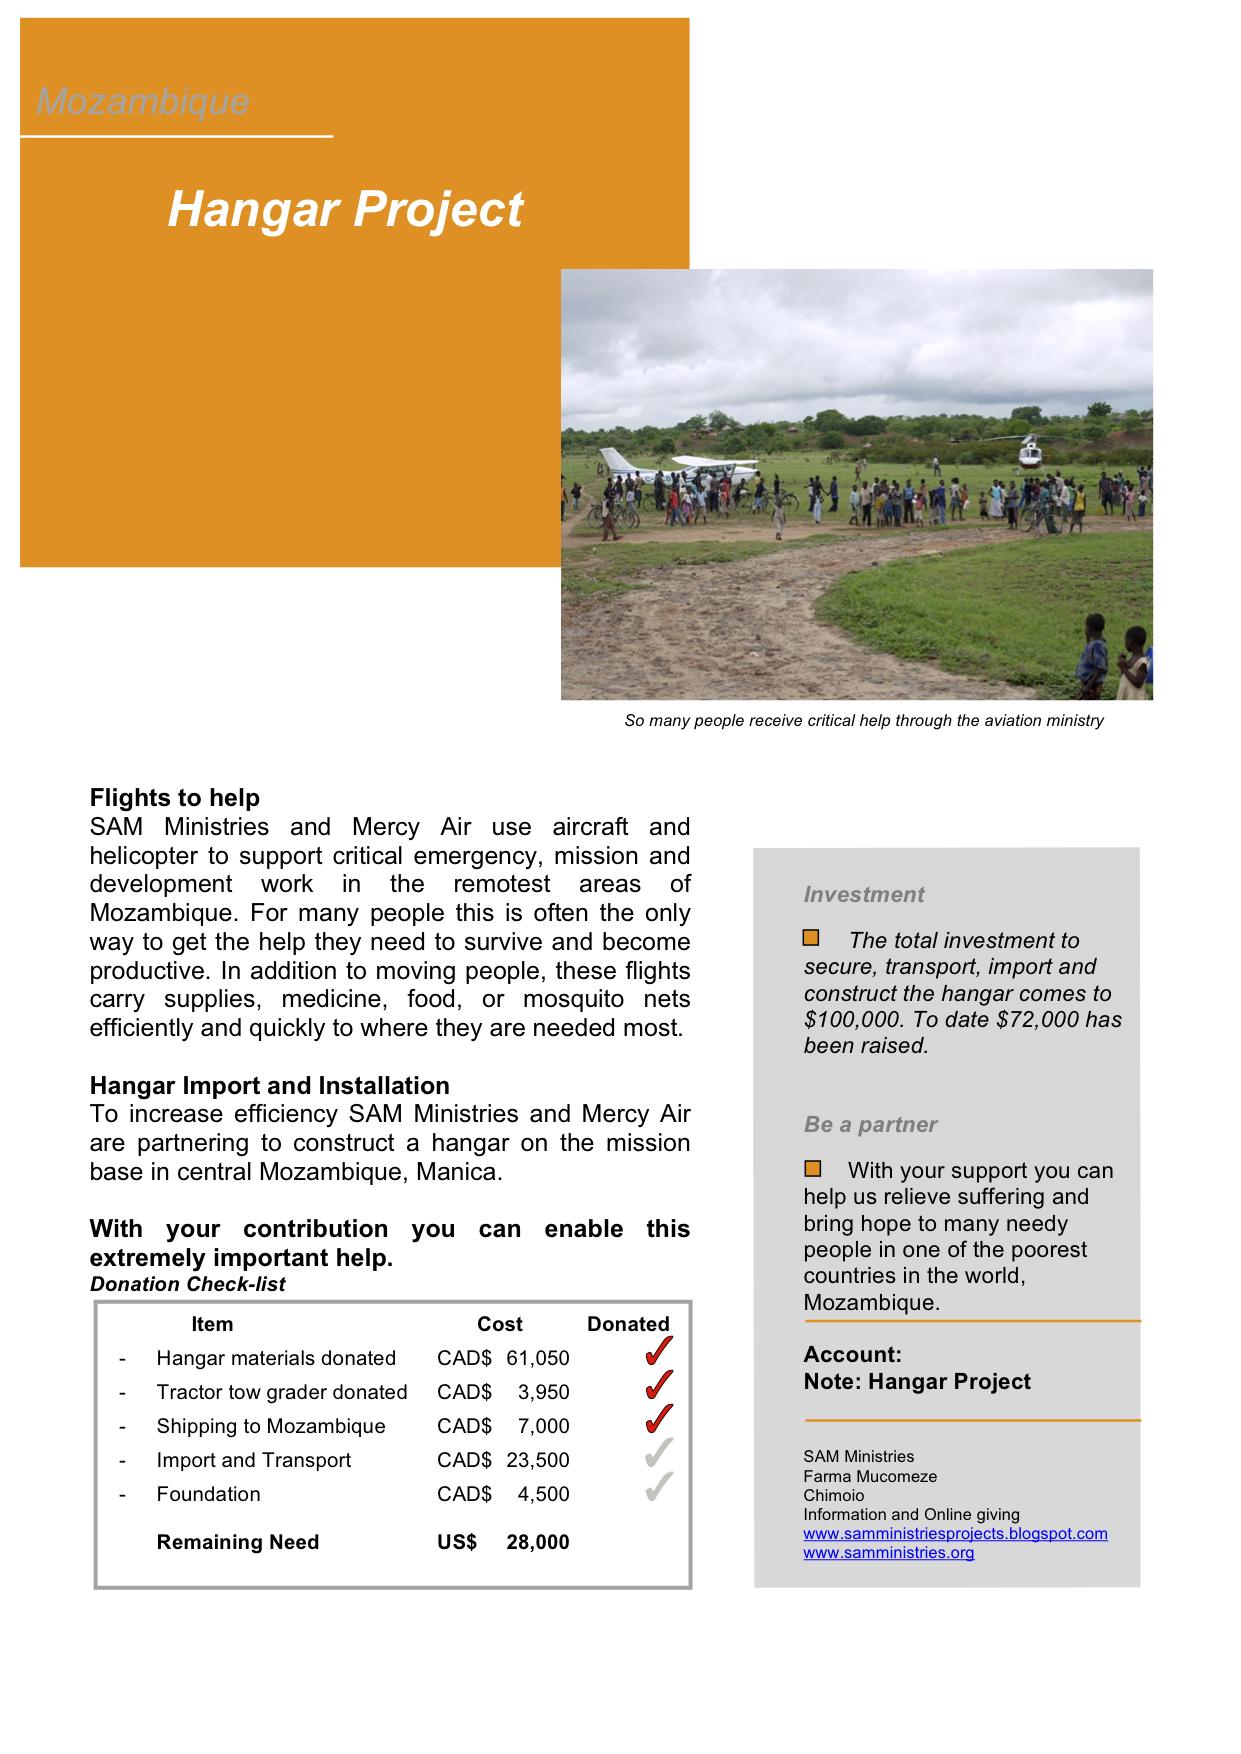 Hangar Project Executive Summary